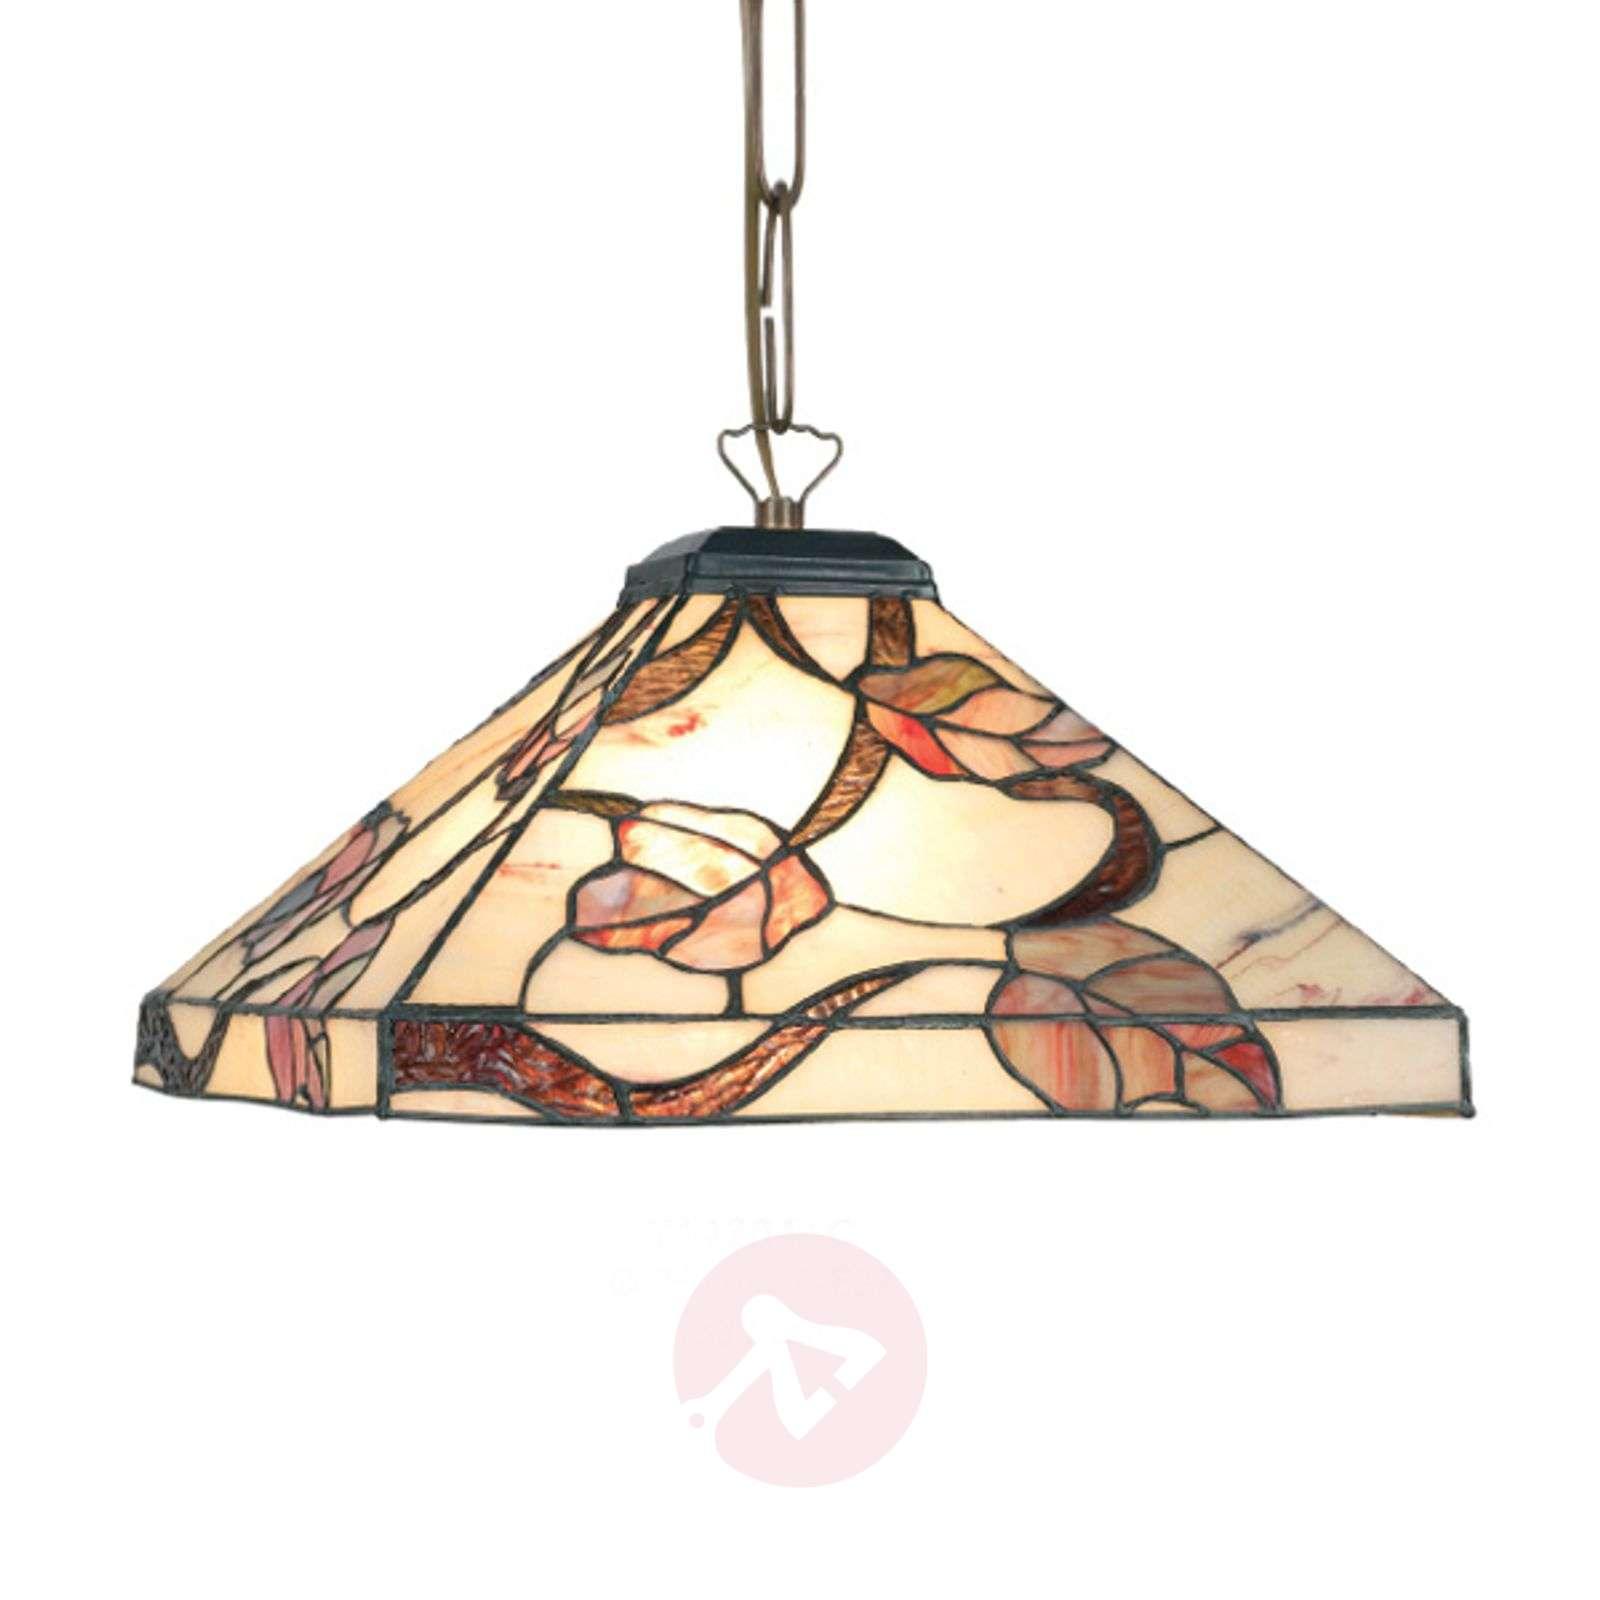 Appolonia hanging light, Tiffany-style-1032134-01